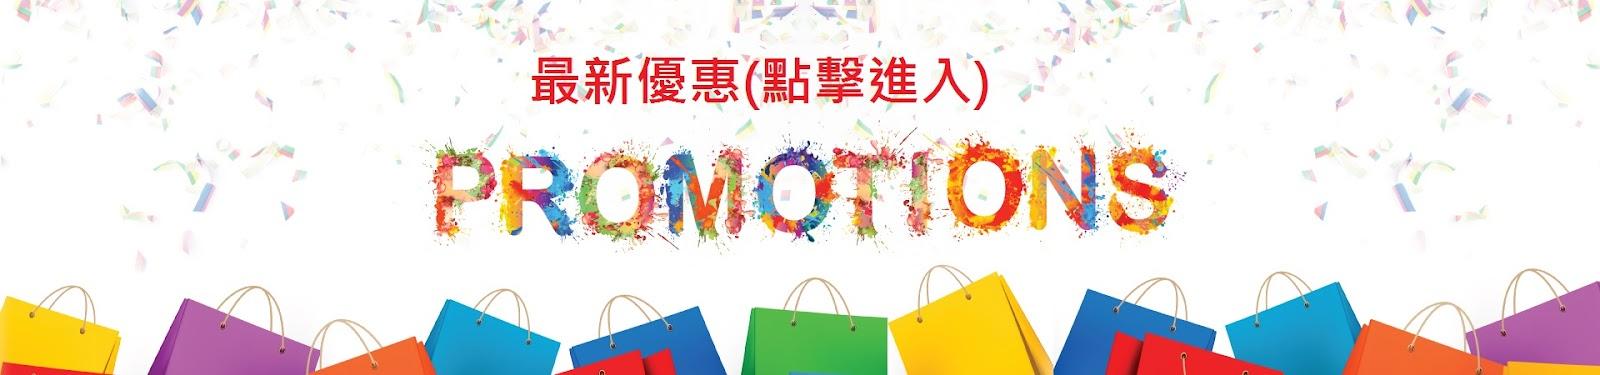 promotion-banner-confetti (1).jpg